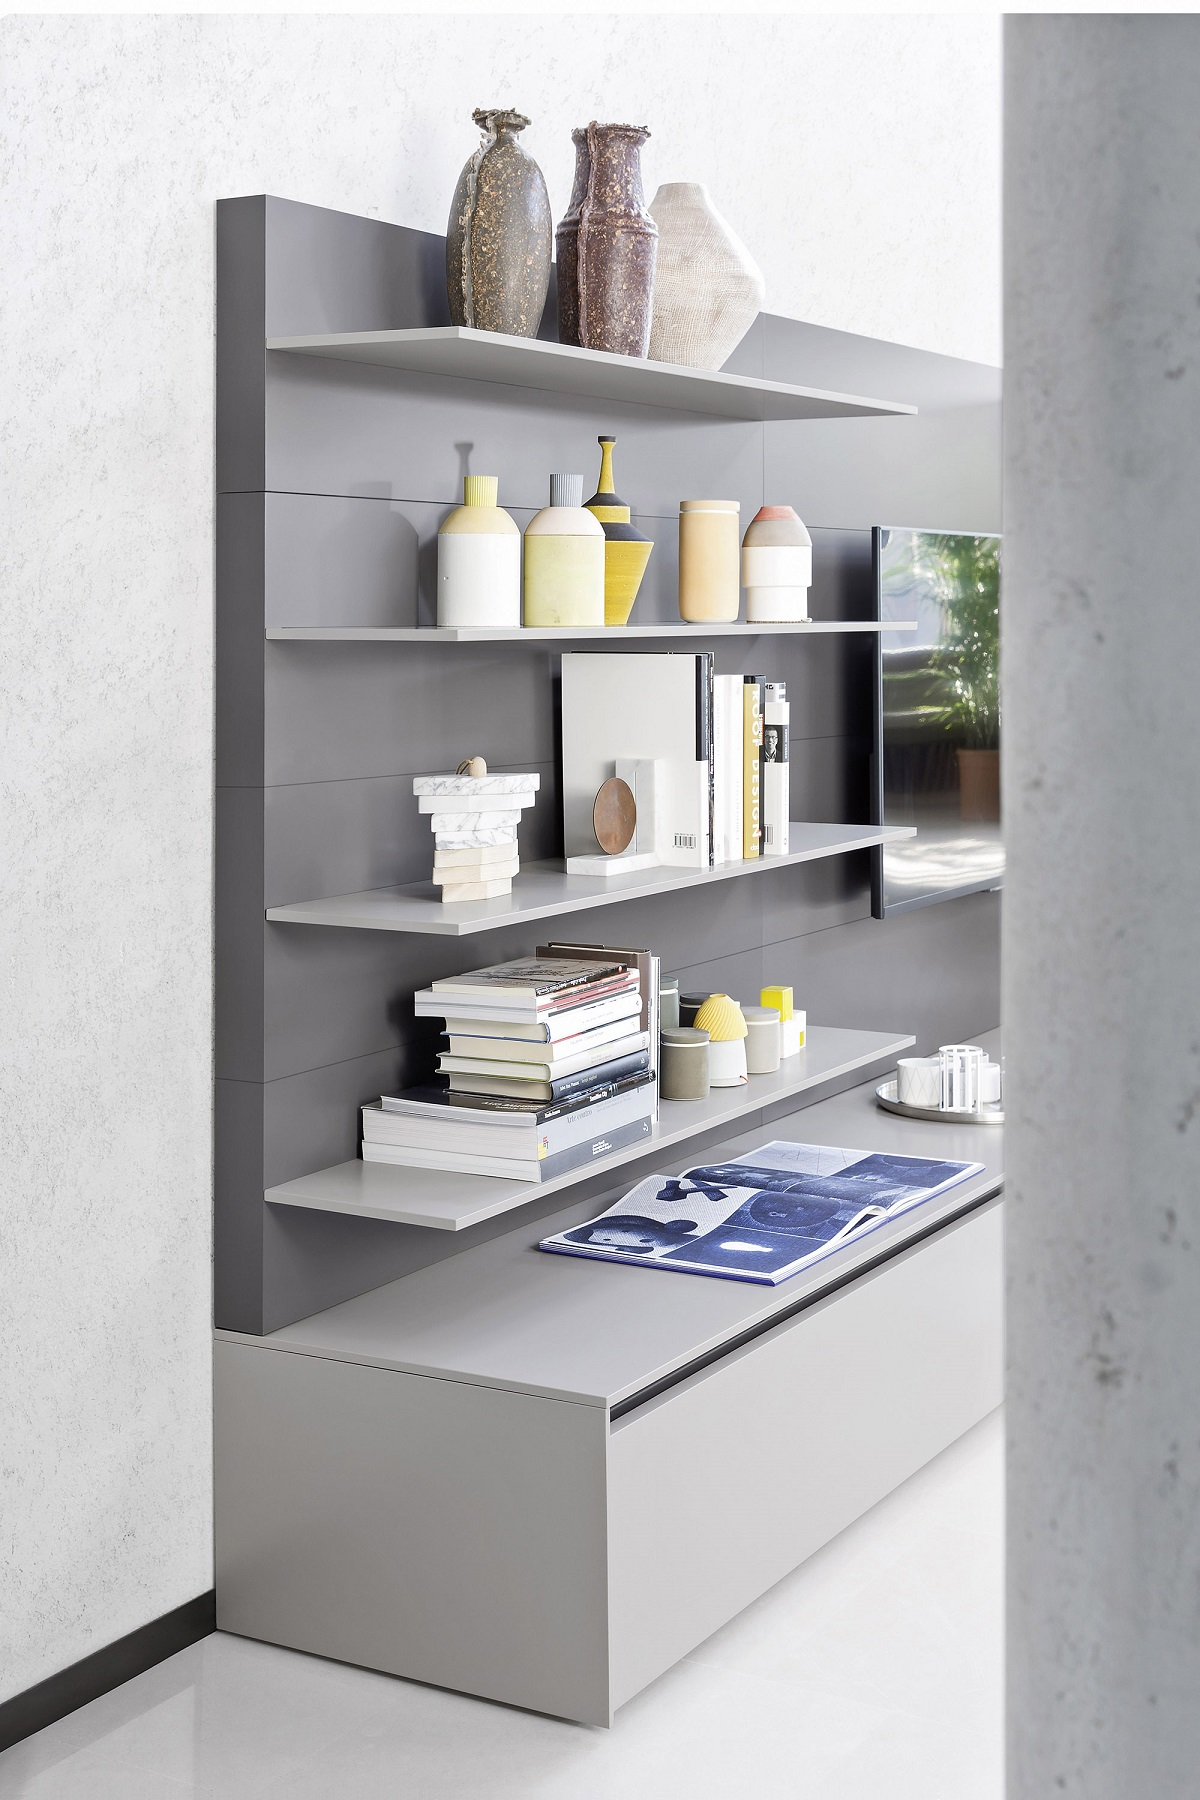 meubles composables wall12 novamobili vestibule paris3 vestibule paris. Black Bedroom Furniture Sets. Home Design Ideas